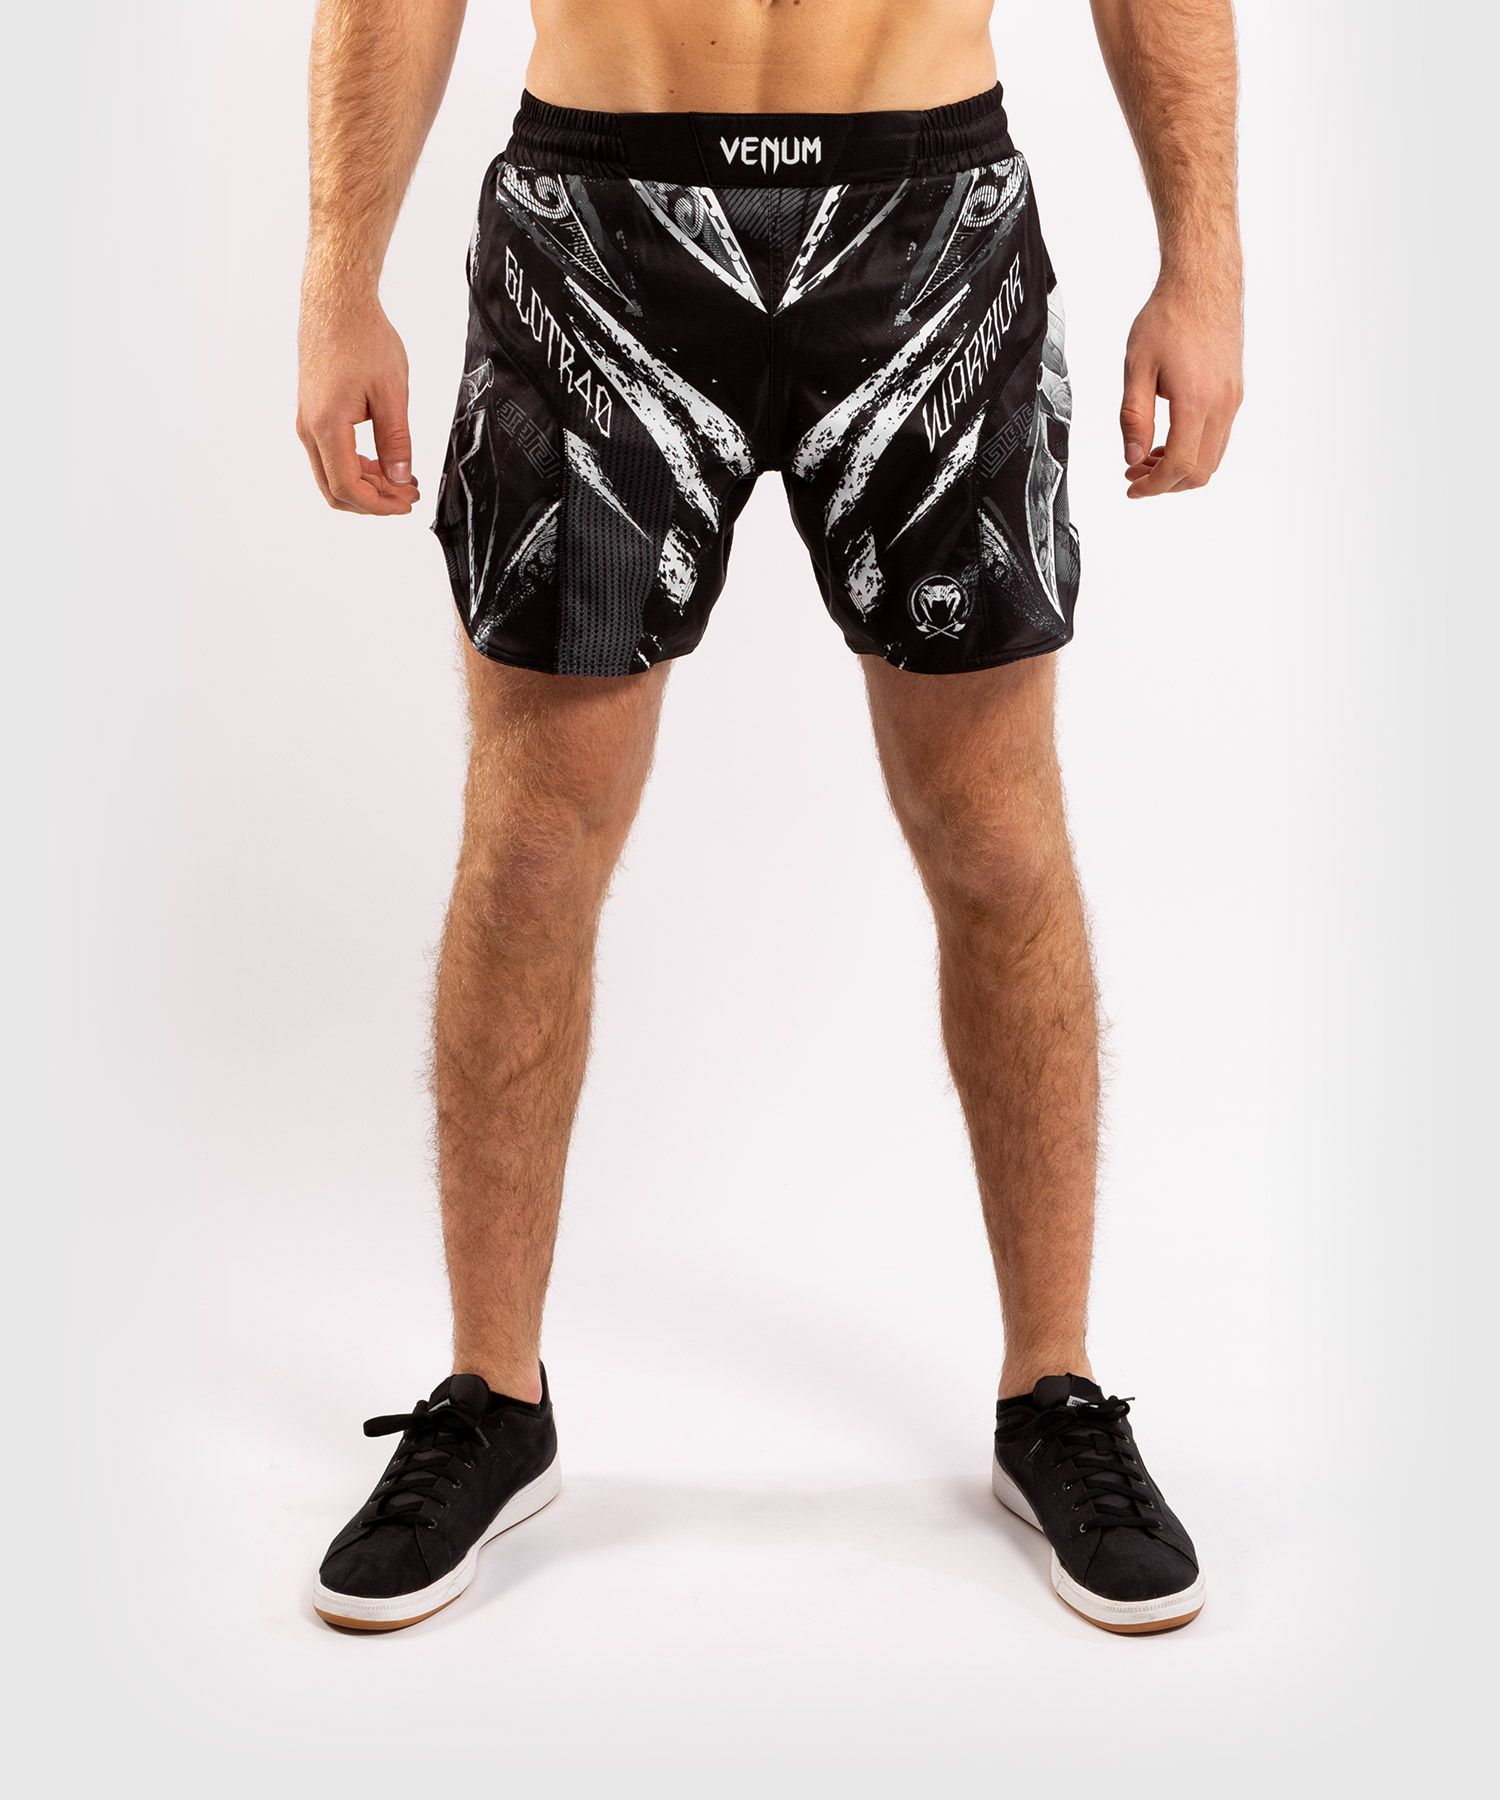 Shorts de combate GLDTR 4.0